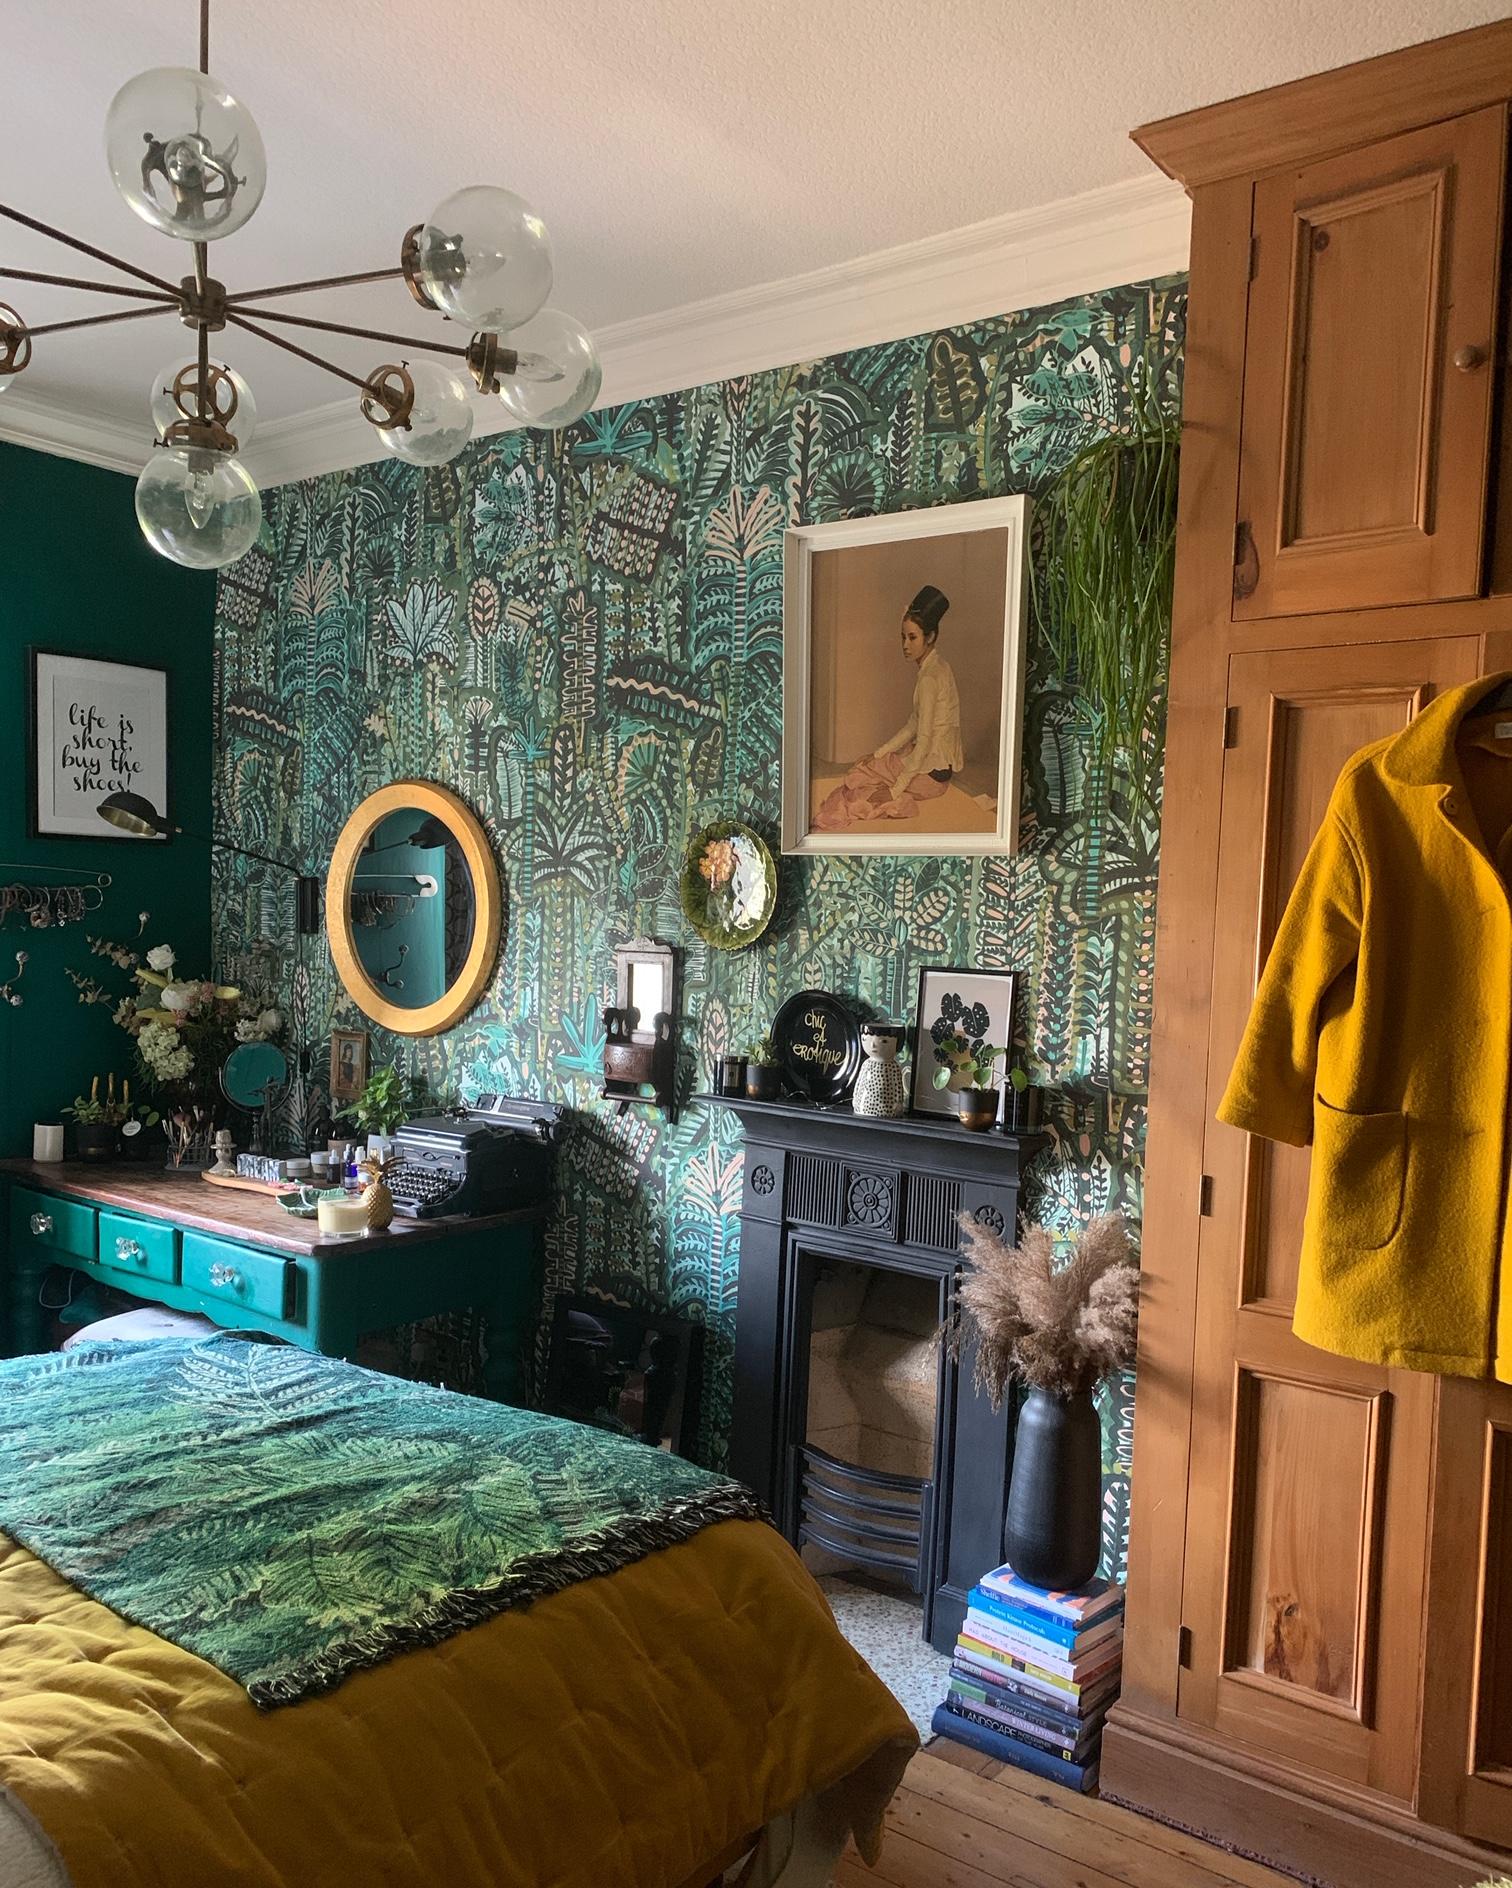 The dreamiest, greeniest bedroom